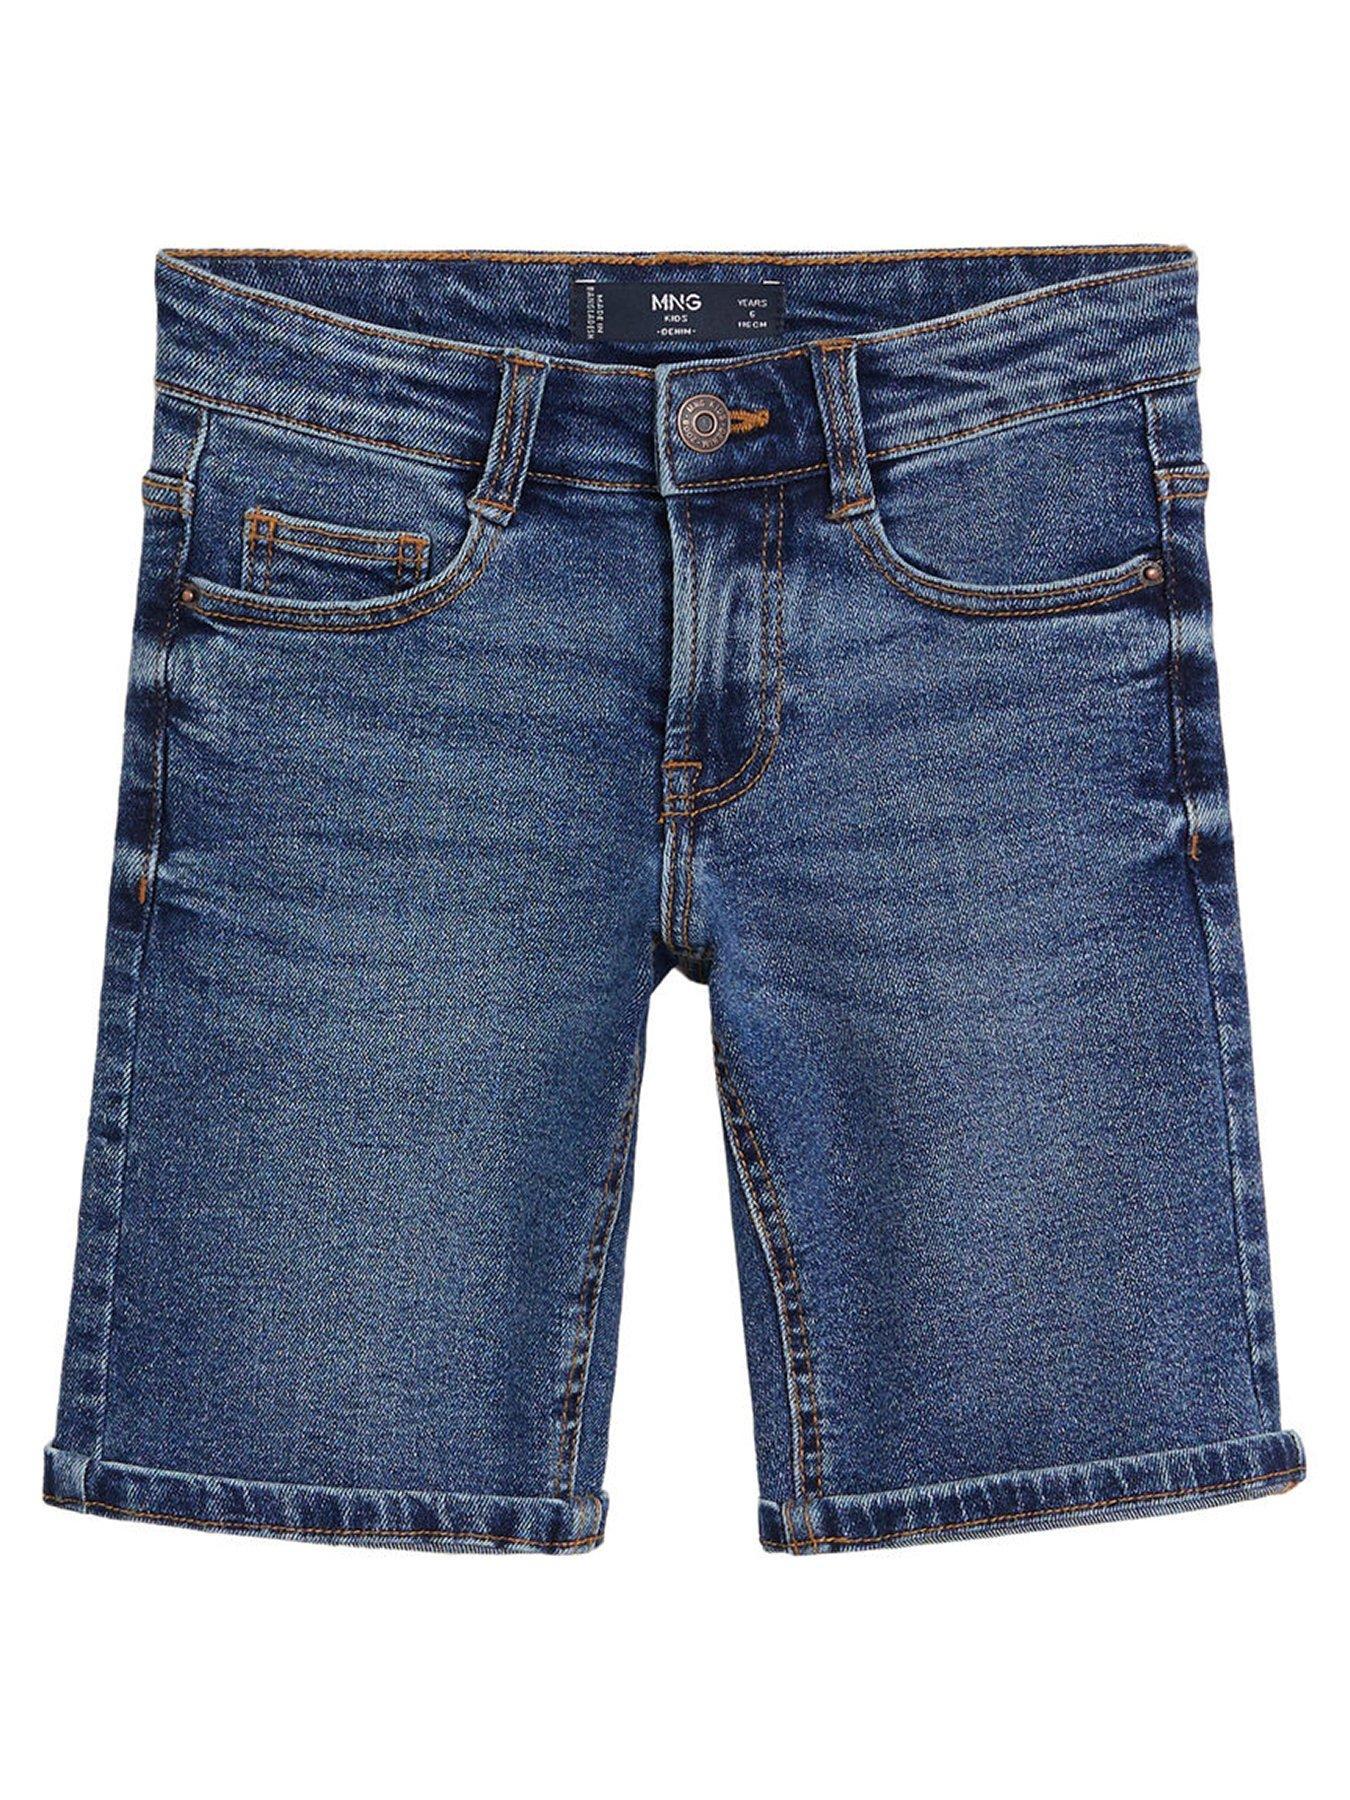 Nasa Logo Adult Short Pants Petite